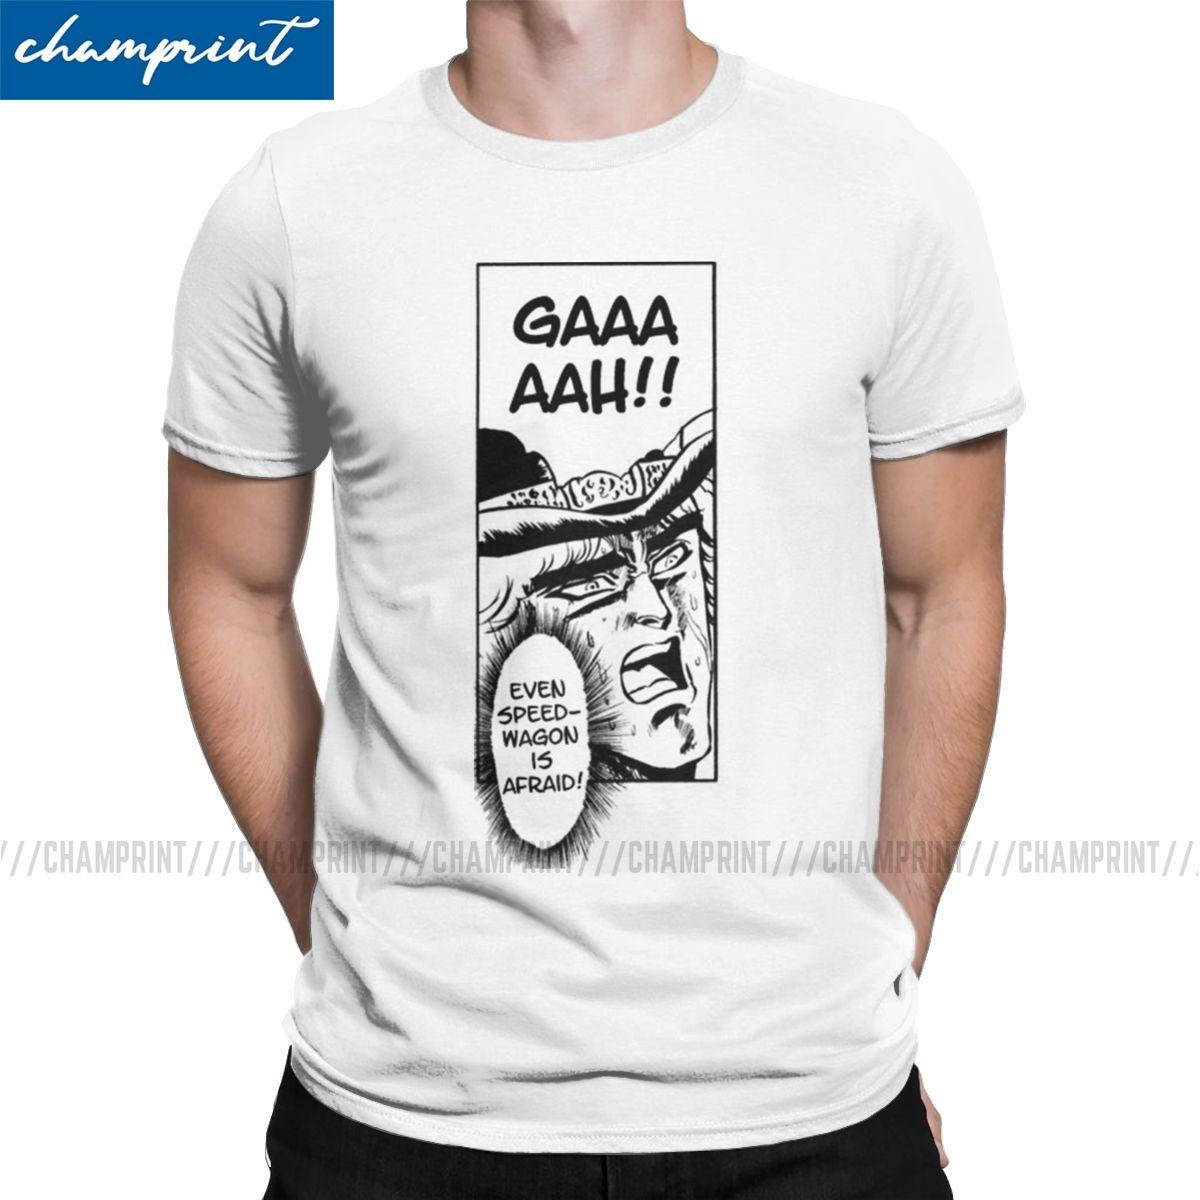 Anche shirt Speedwagon ha paura T per uomini divertenti T-shirt Jojos Bizzarre Avventure Anime Manga Jjba Tee T-shirt manica di vestiti